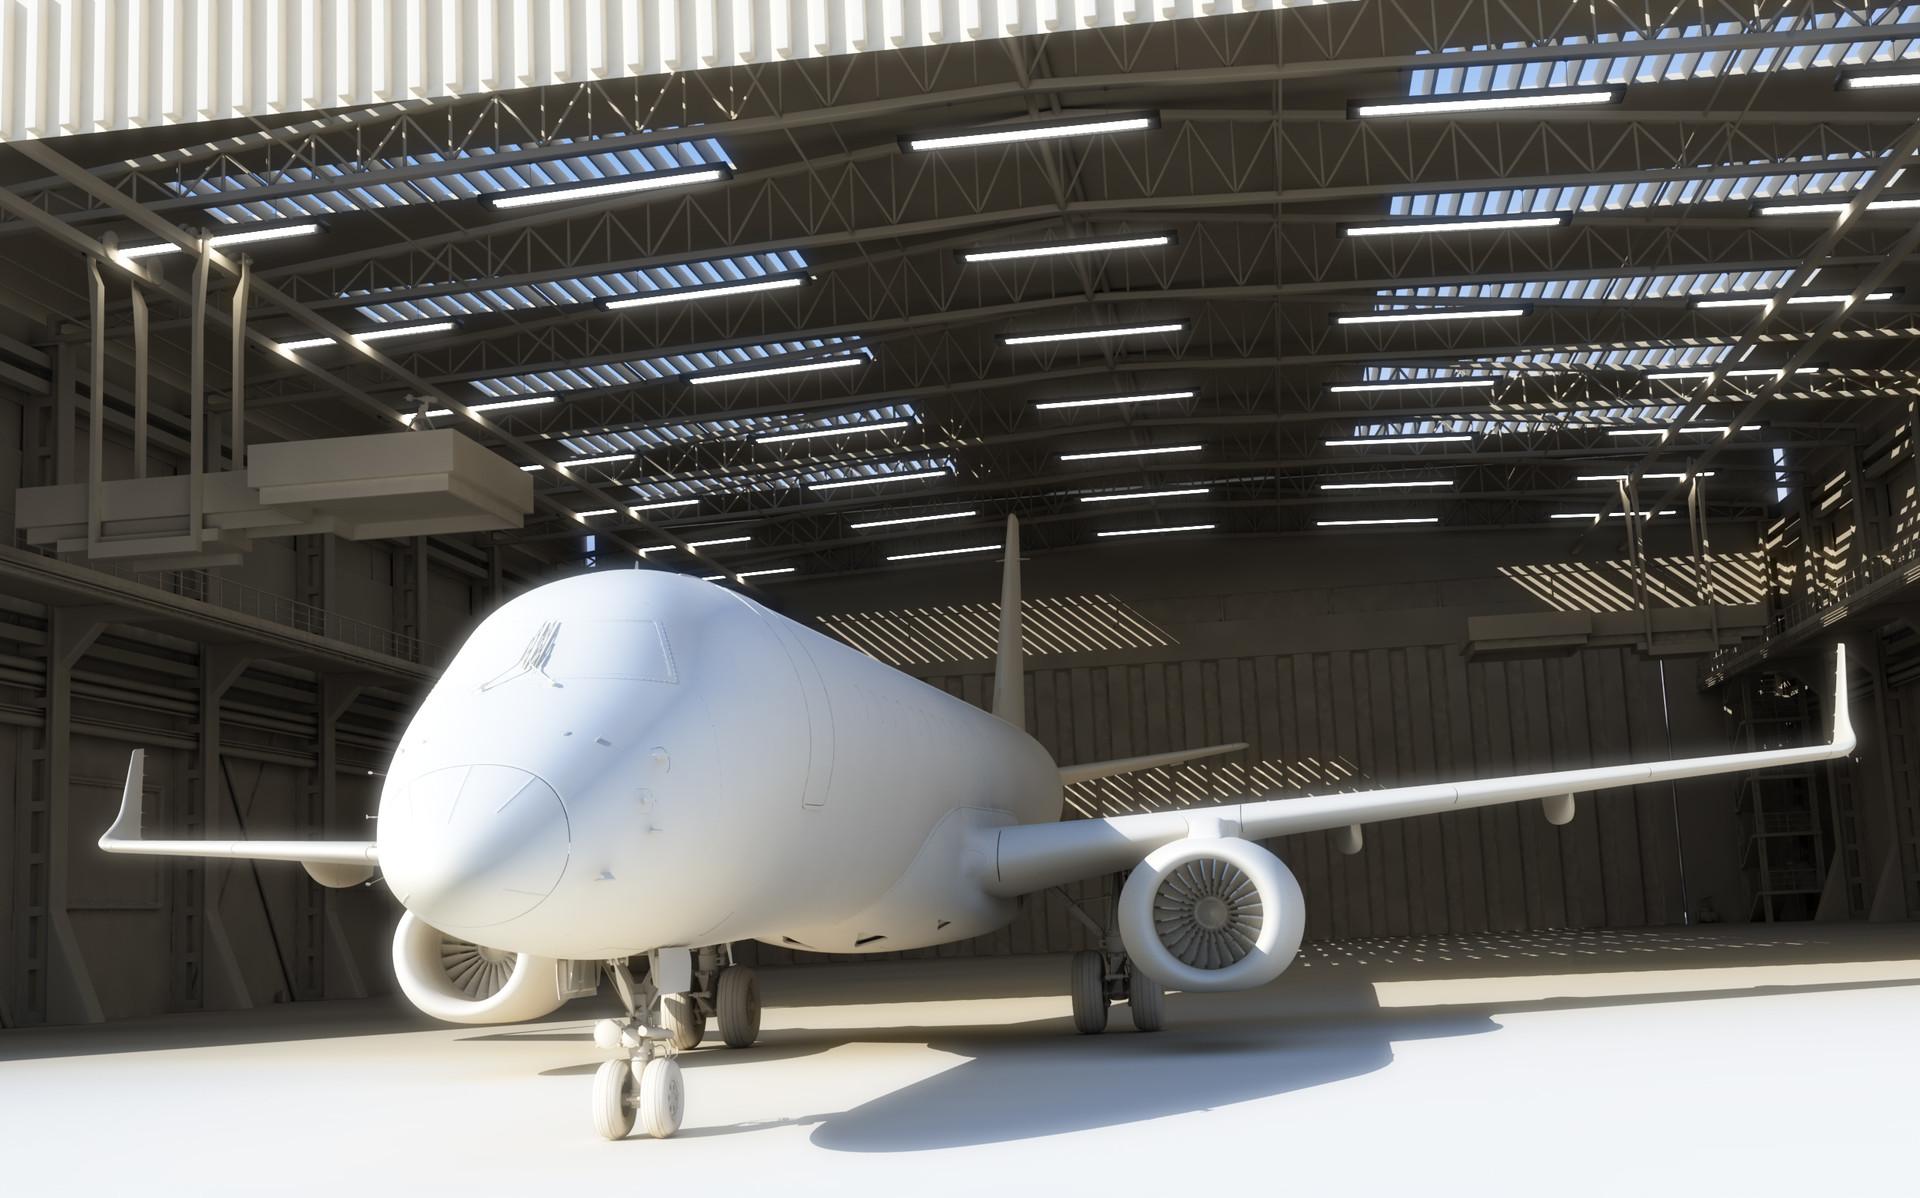 Tharso arrue 1 190 hangar clay pslow